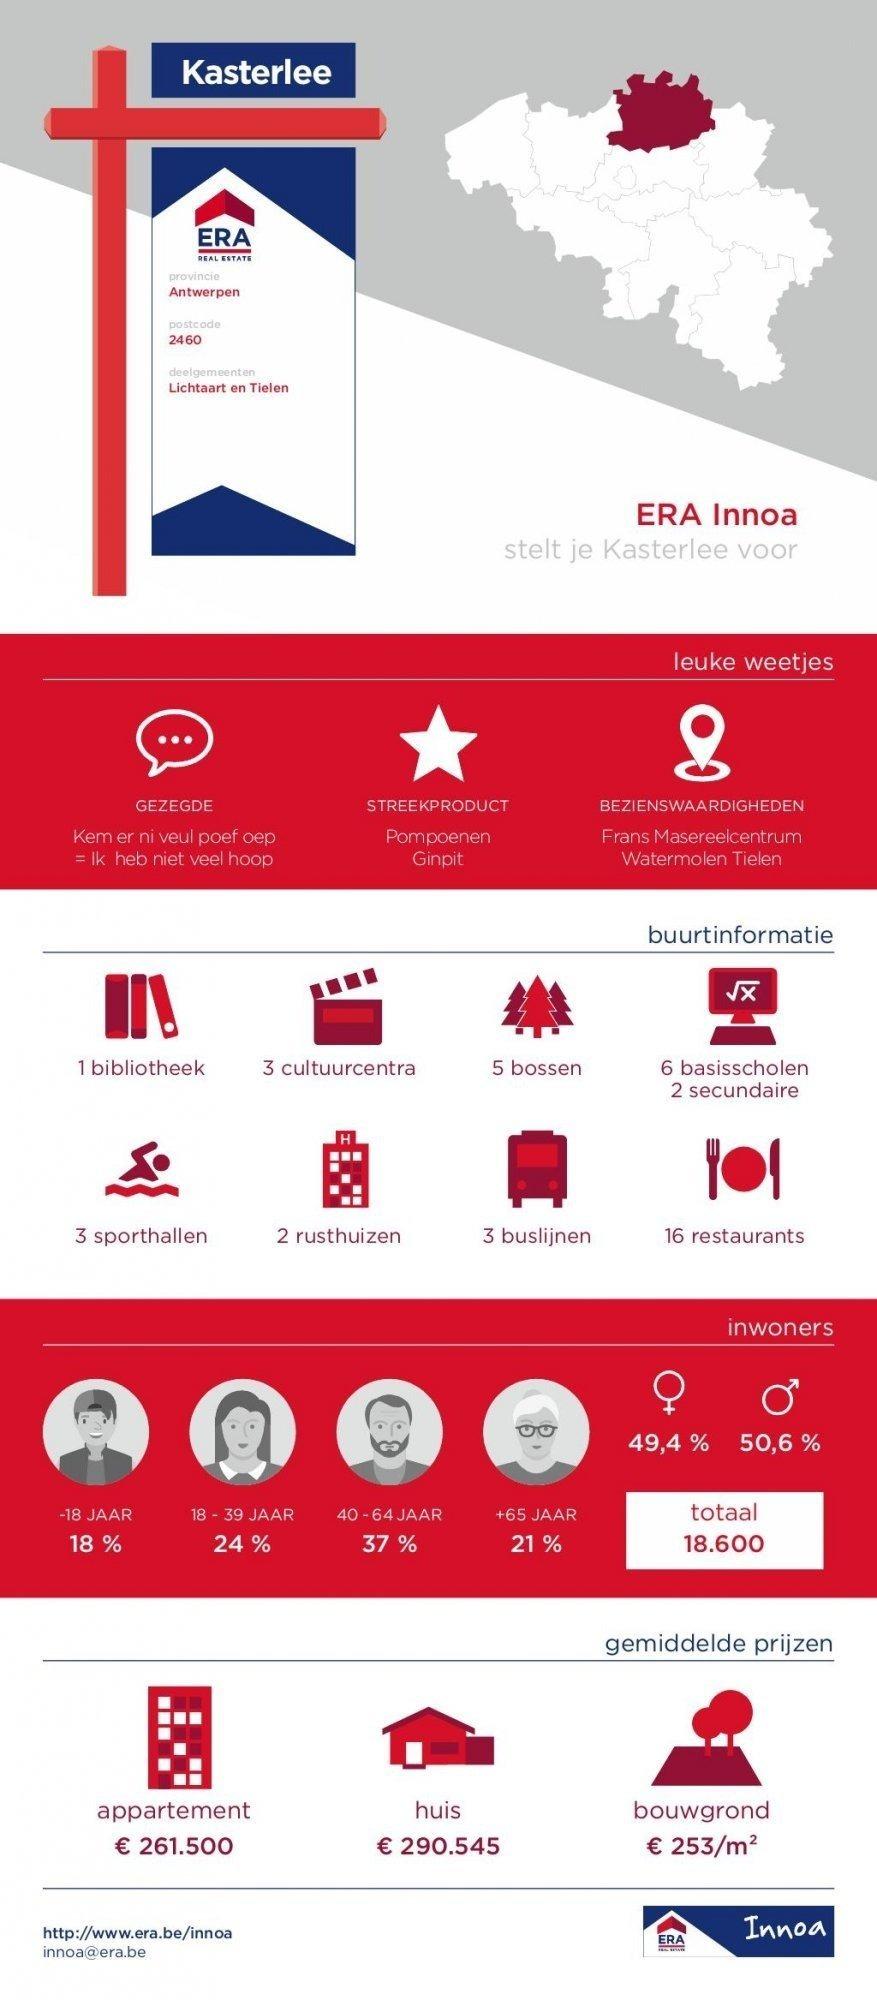 Infographic Kasterlee - ERA Innoa